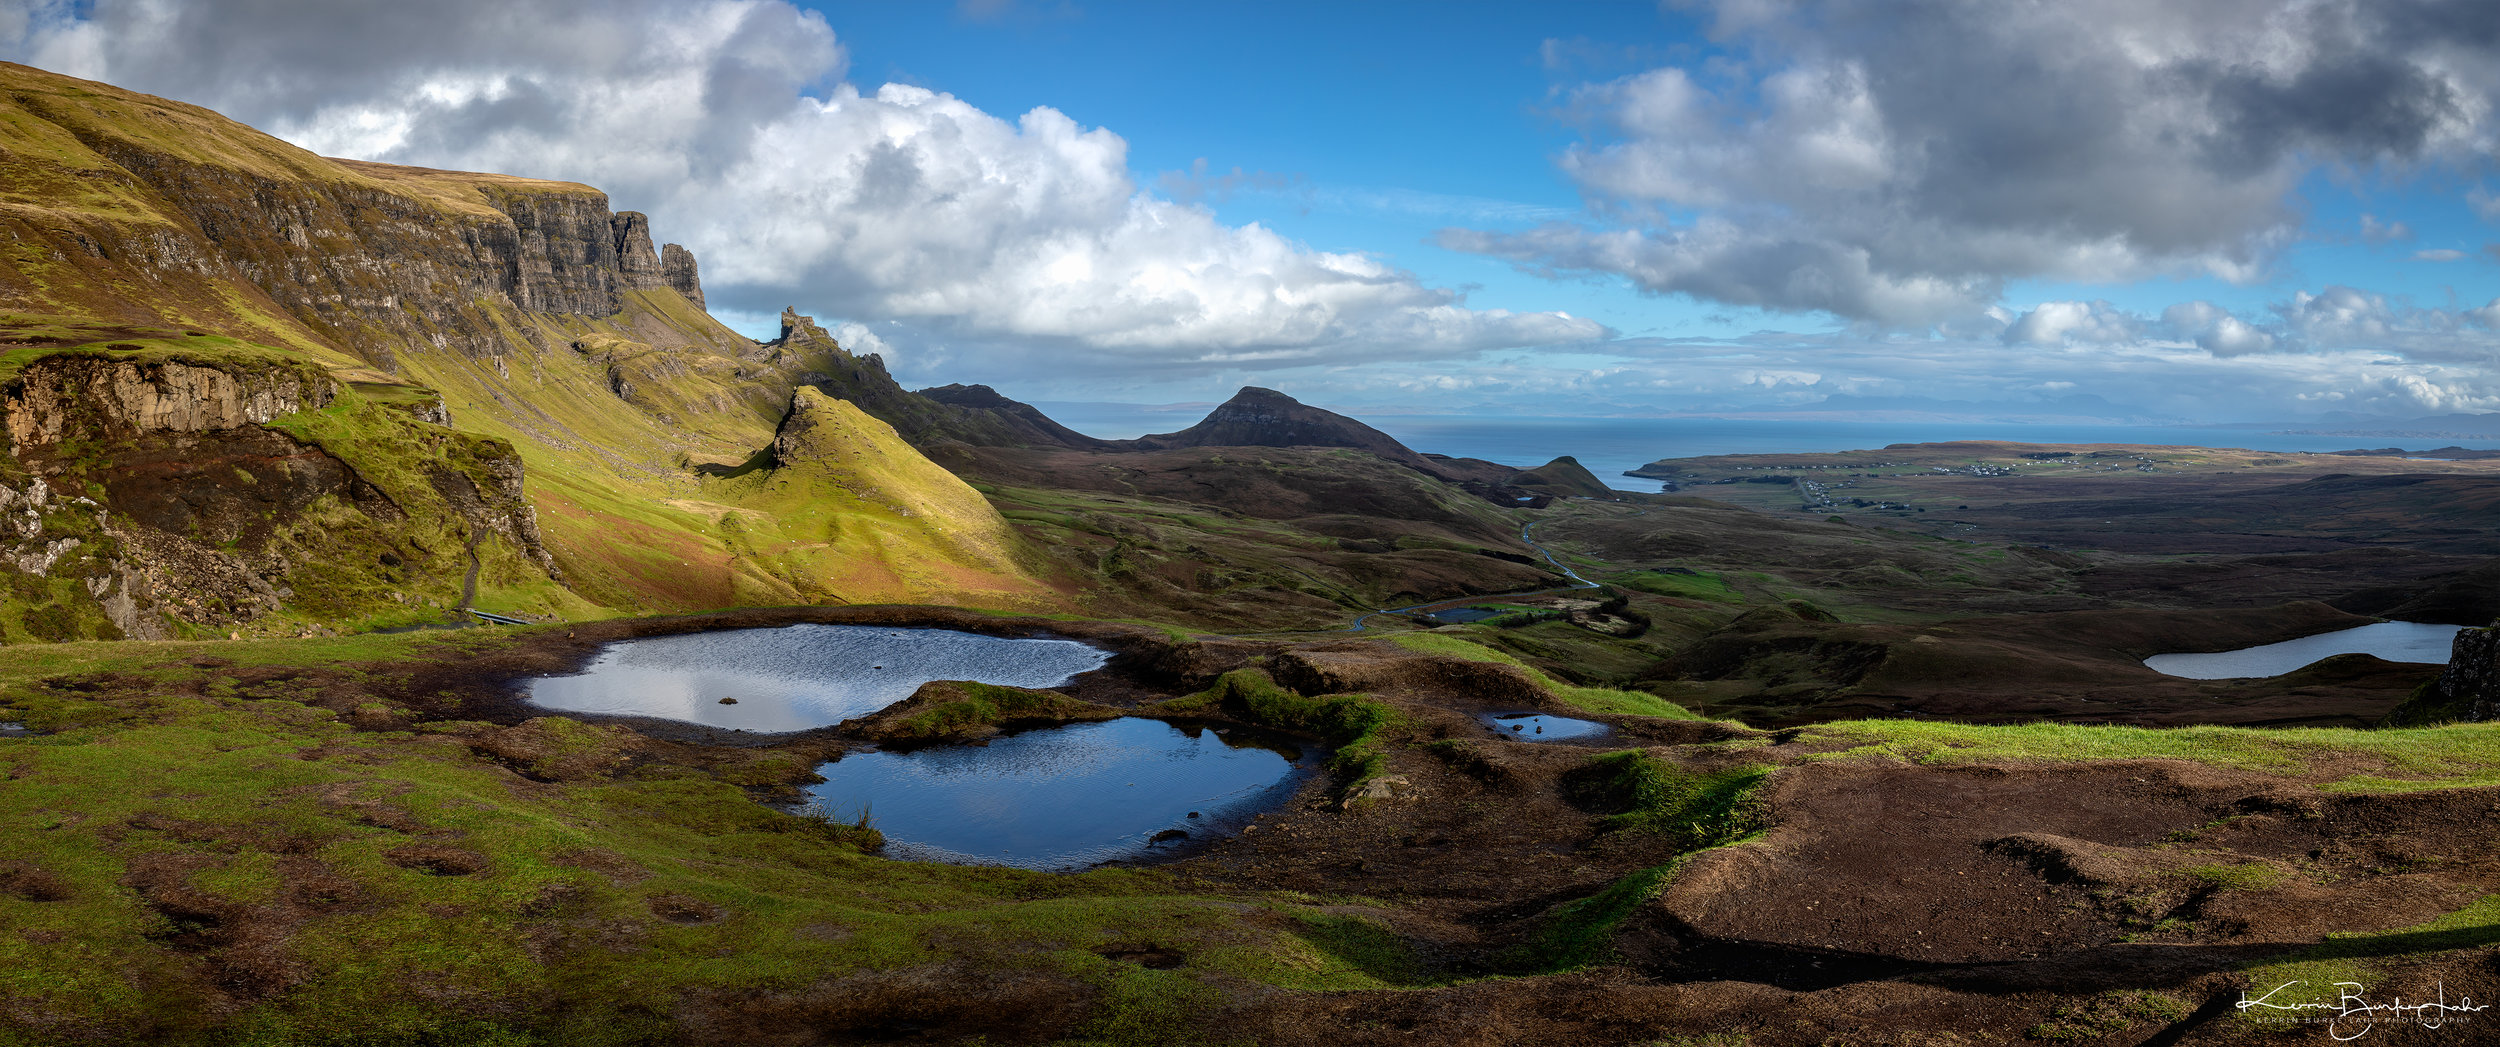 10-15-2018-Isle-of-Skye-44-Pano-3.jpg